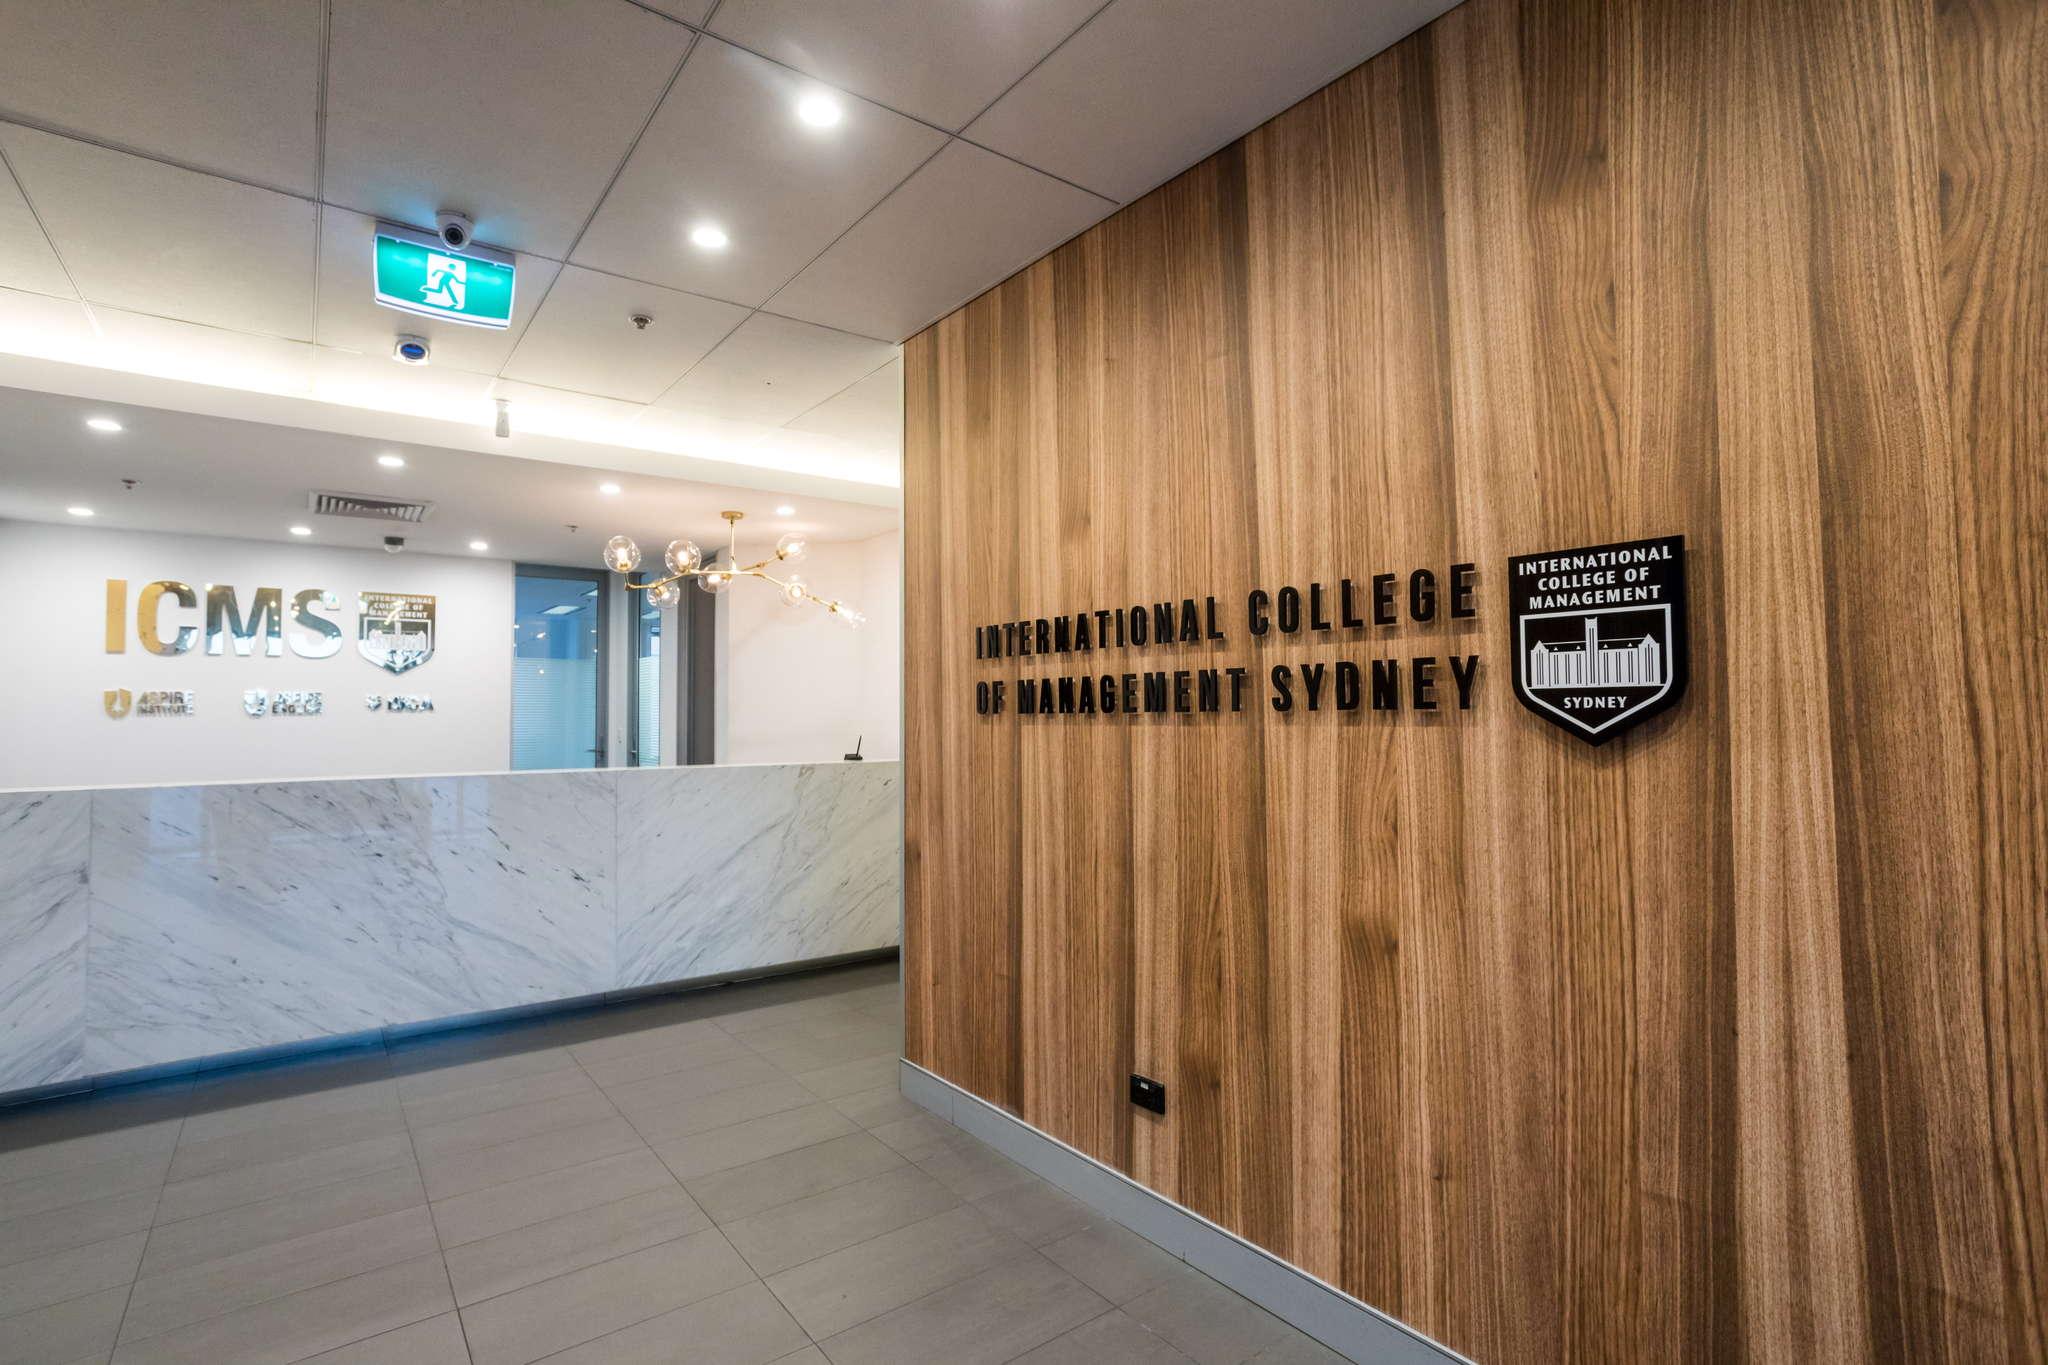 International_College_of_Management_Sydney_3_190720_ICMS-081